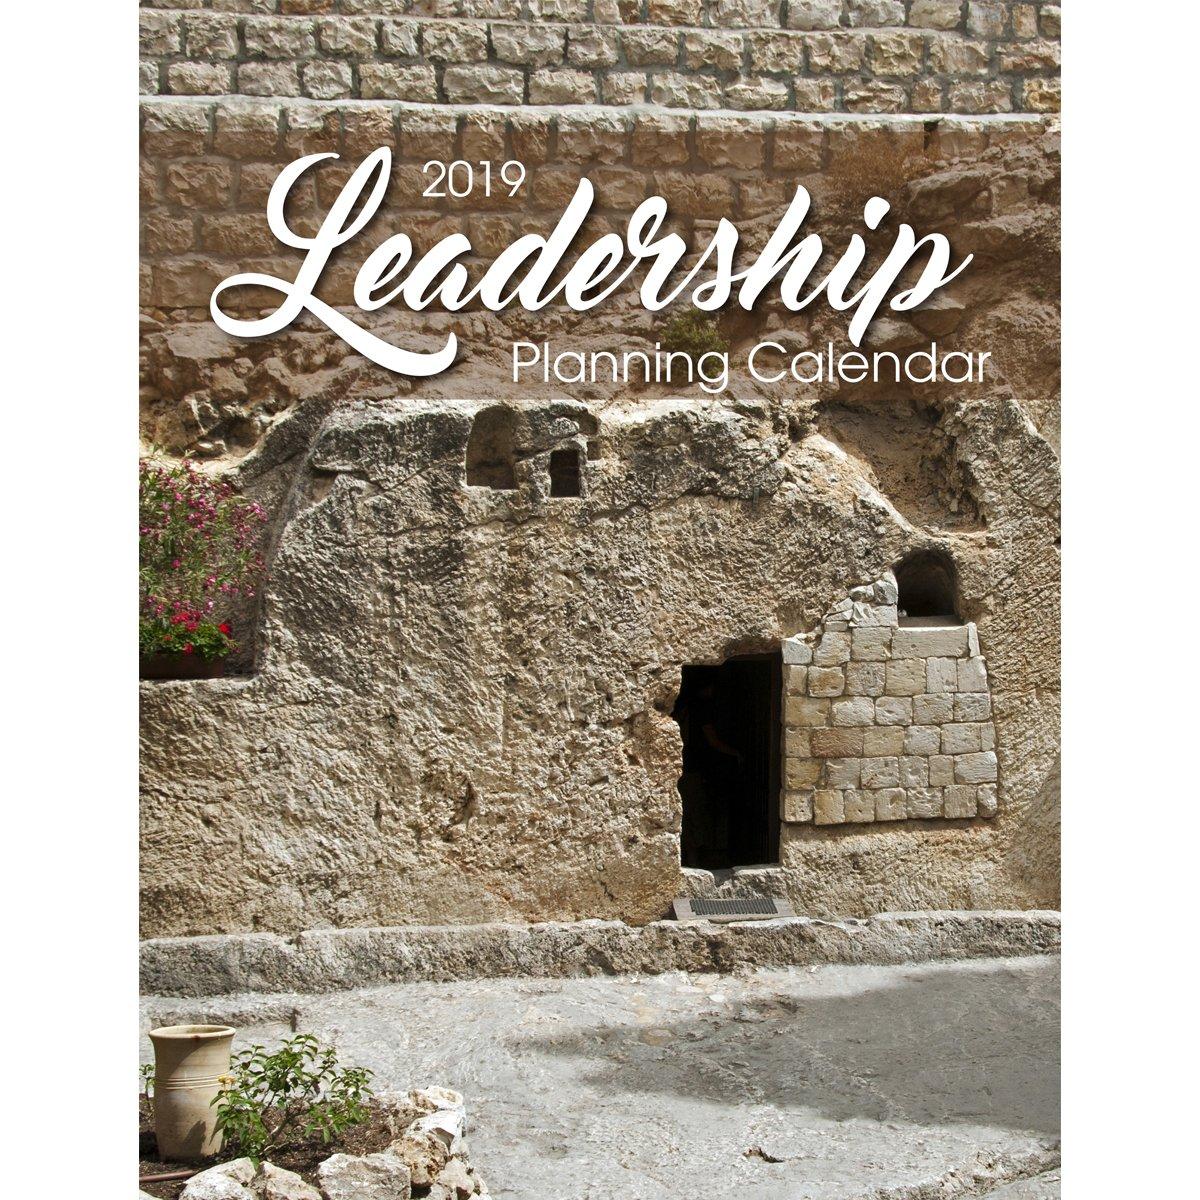 2019 Leadership Planning Calendar